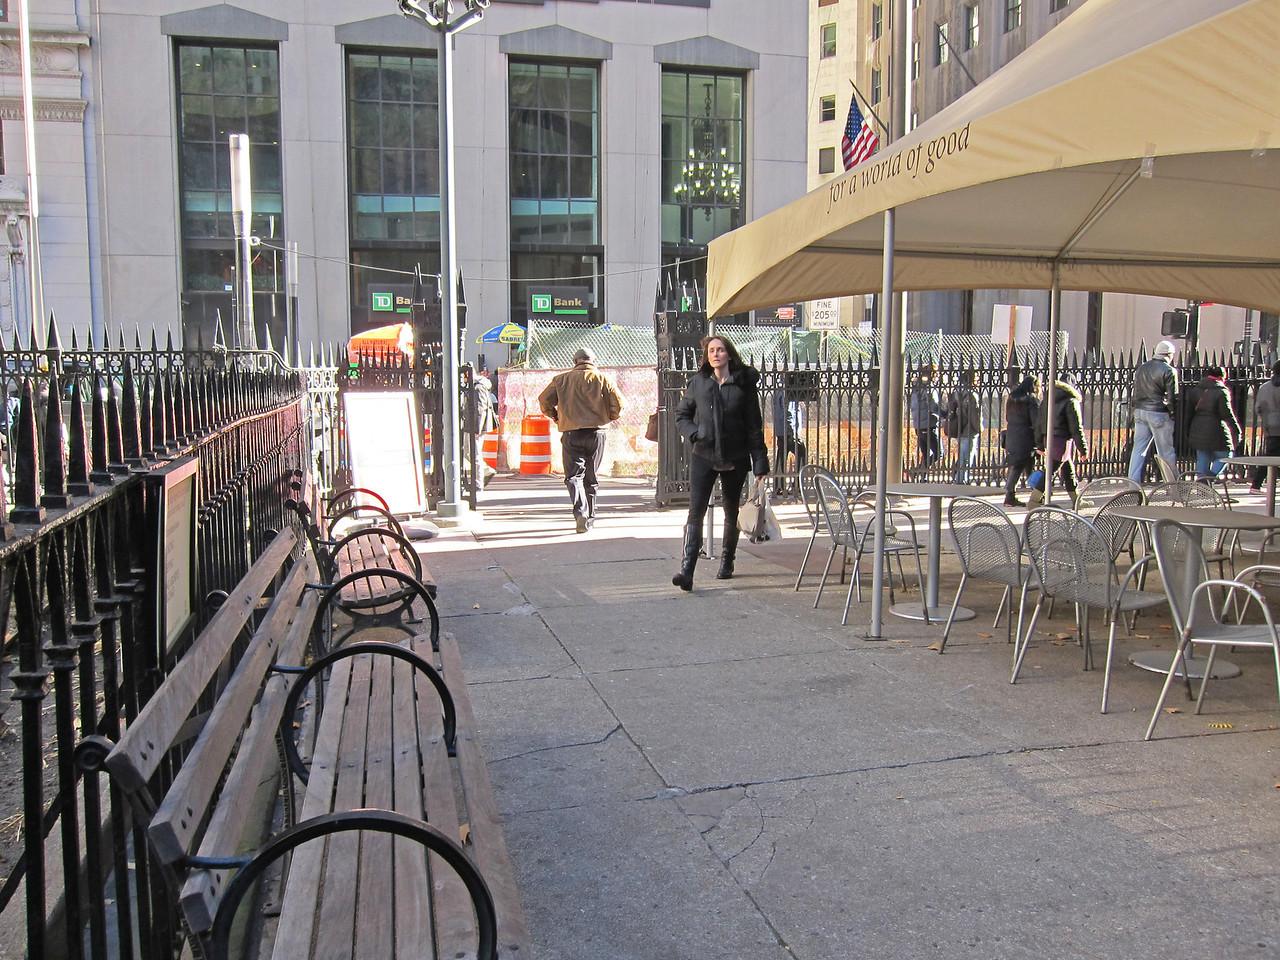 xTrinity Wall Street Church_2013-11-20_4664_outside north entryway looking at Broadway gates